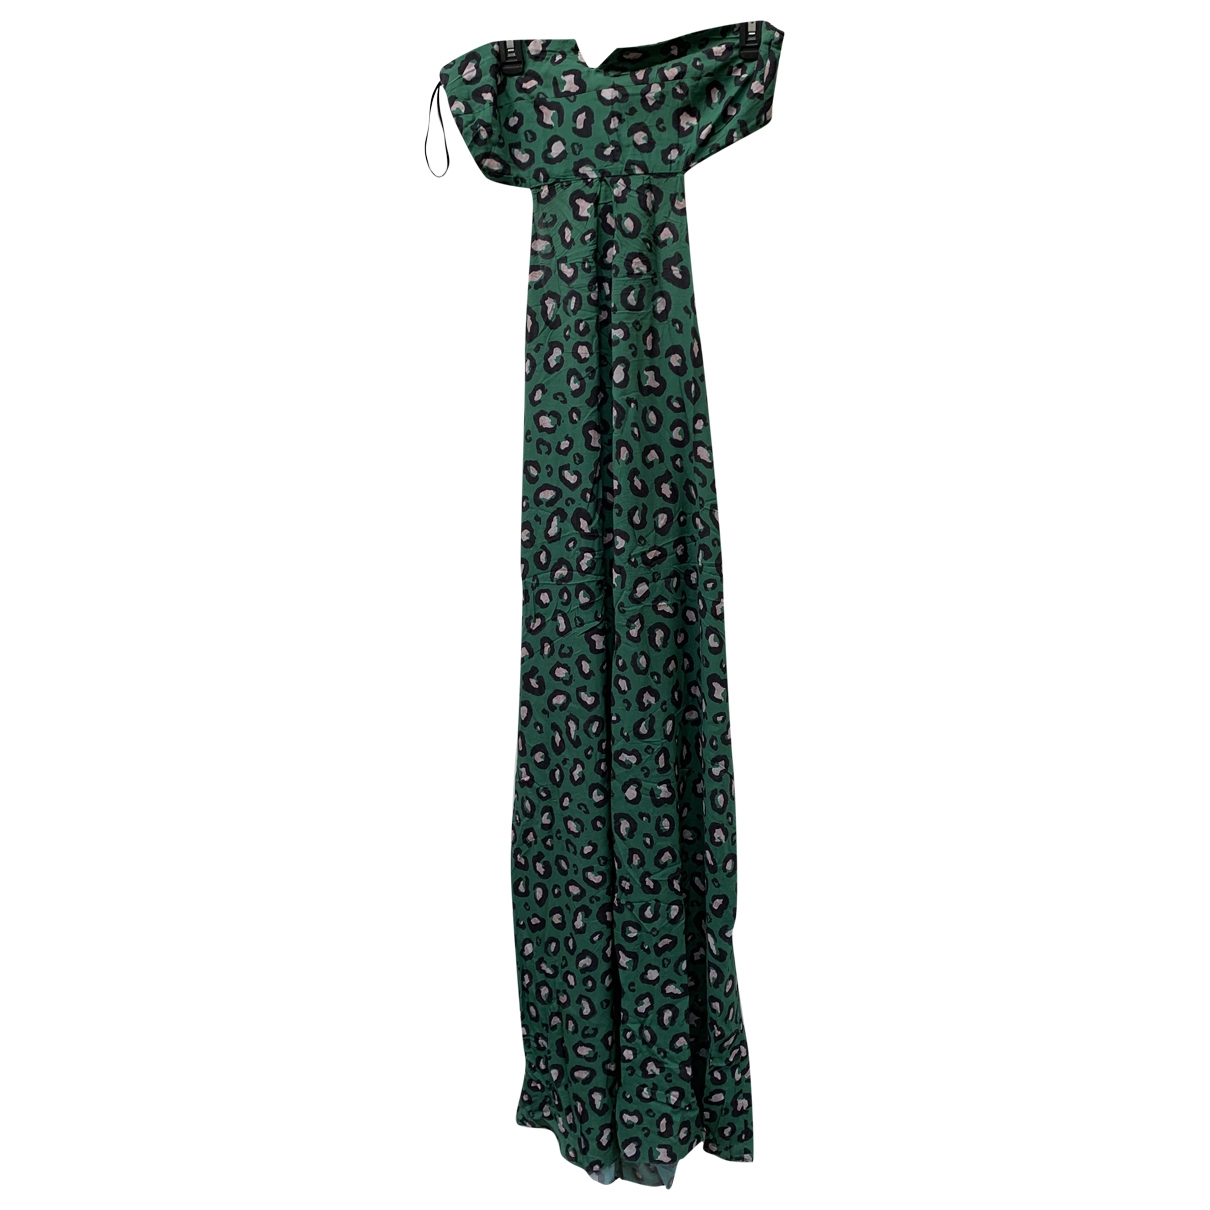 Adriana Degreas \N Khaki dress for Women L International